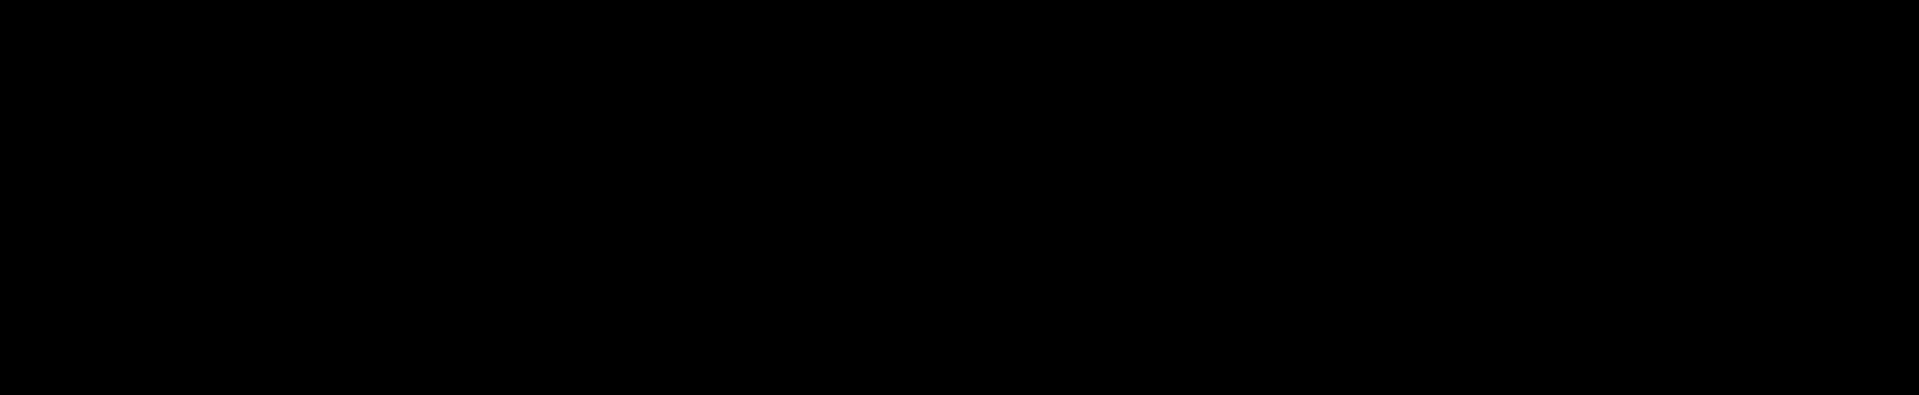 christinelamot-07